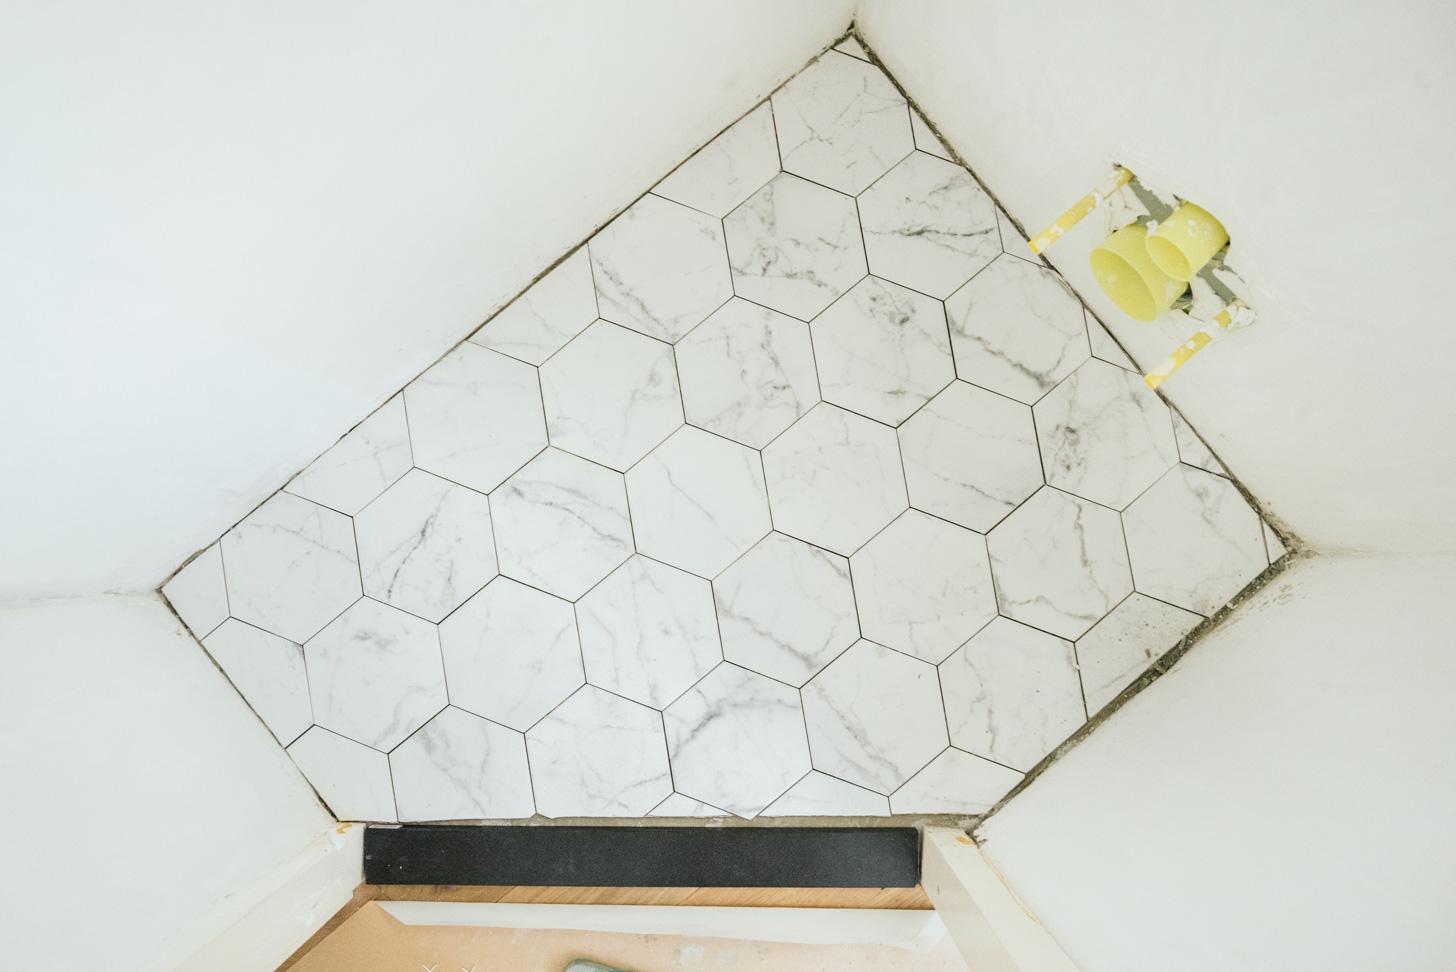 hexagon tegels leggen